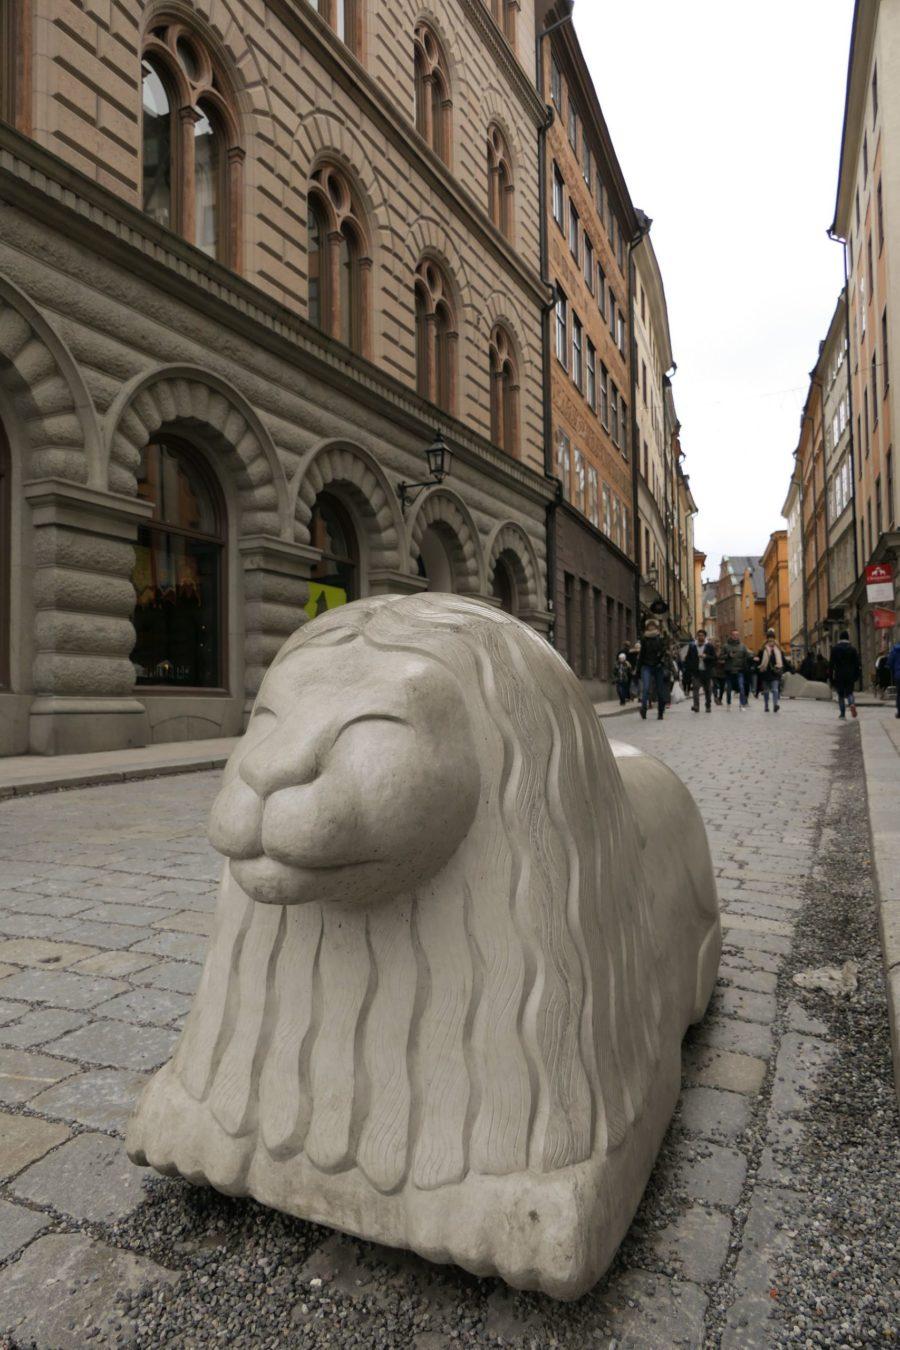 Stockholm Schweden Gamla Stan Stadsholmen Altstadt Gasse Löwe